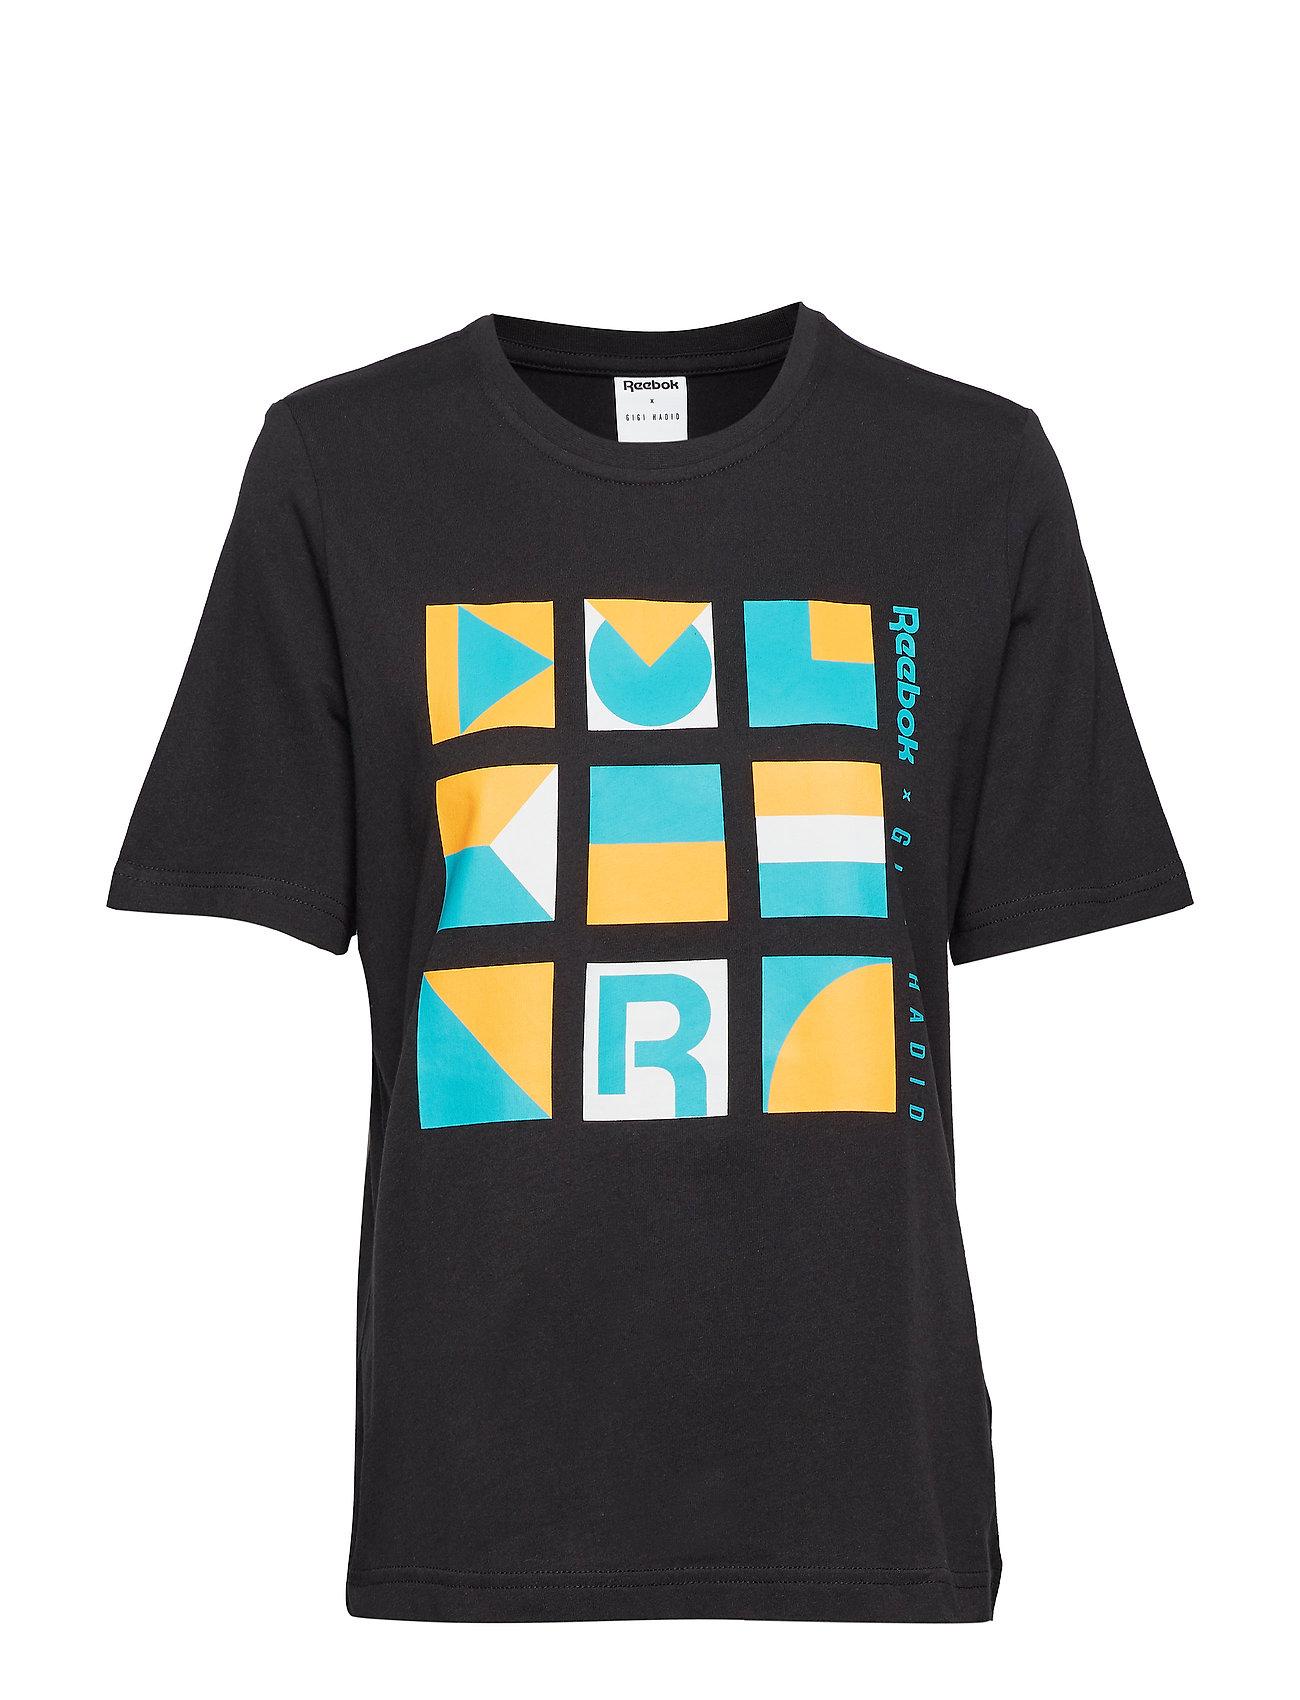 Reebok Classics Gigi Tshirt T-shirts & Tops Short-sleeved Svart Reebok Classics